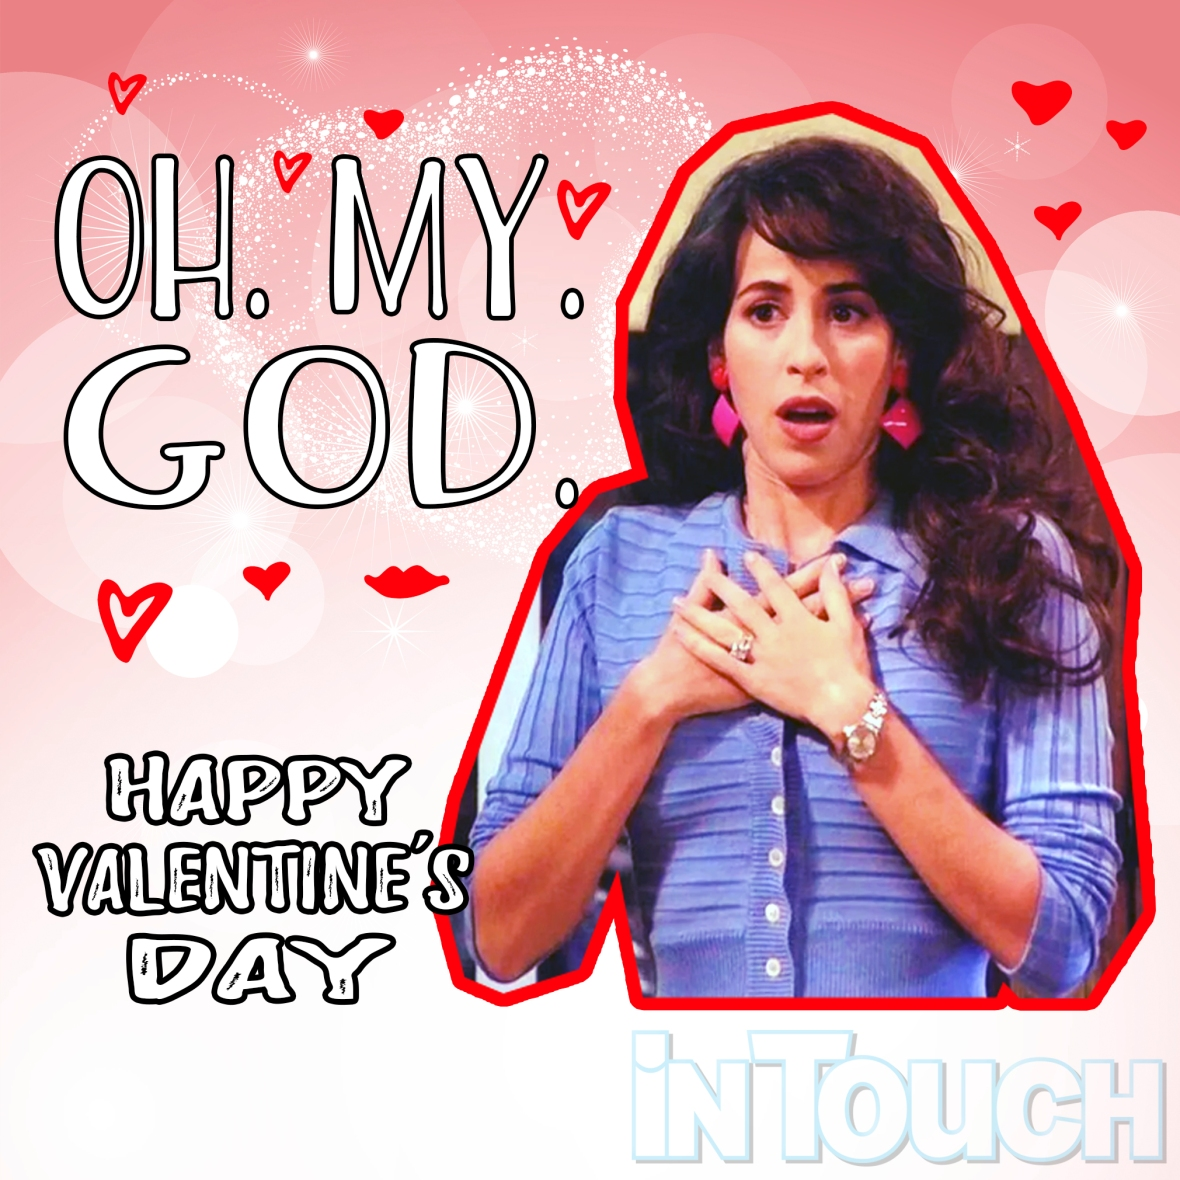 friends valentine's day card 7